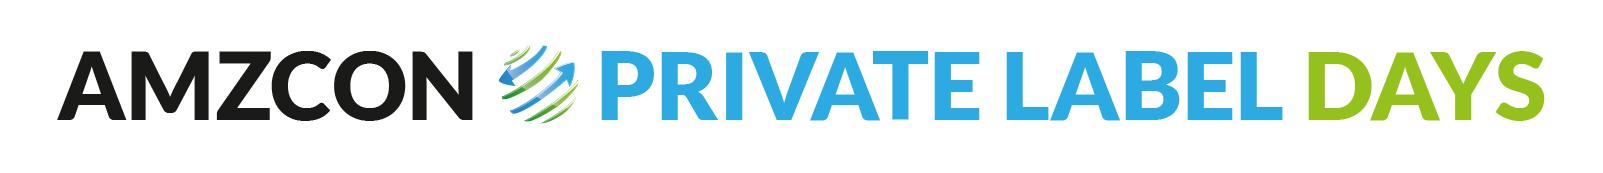 amzcon private label days logo